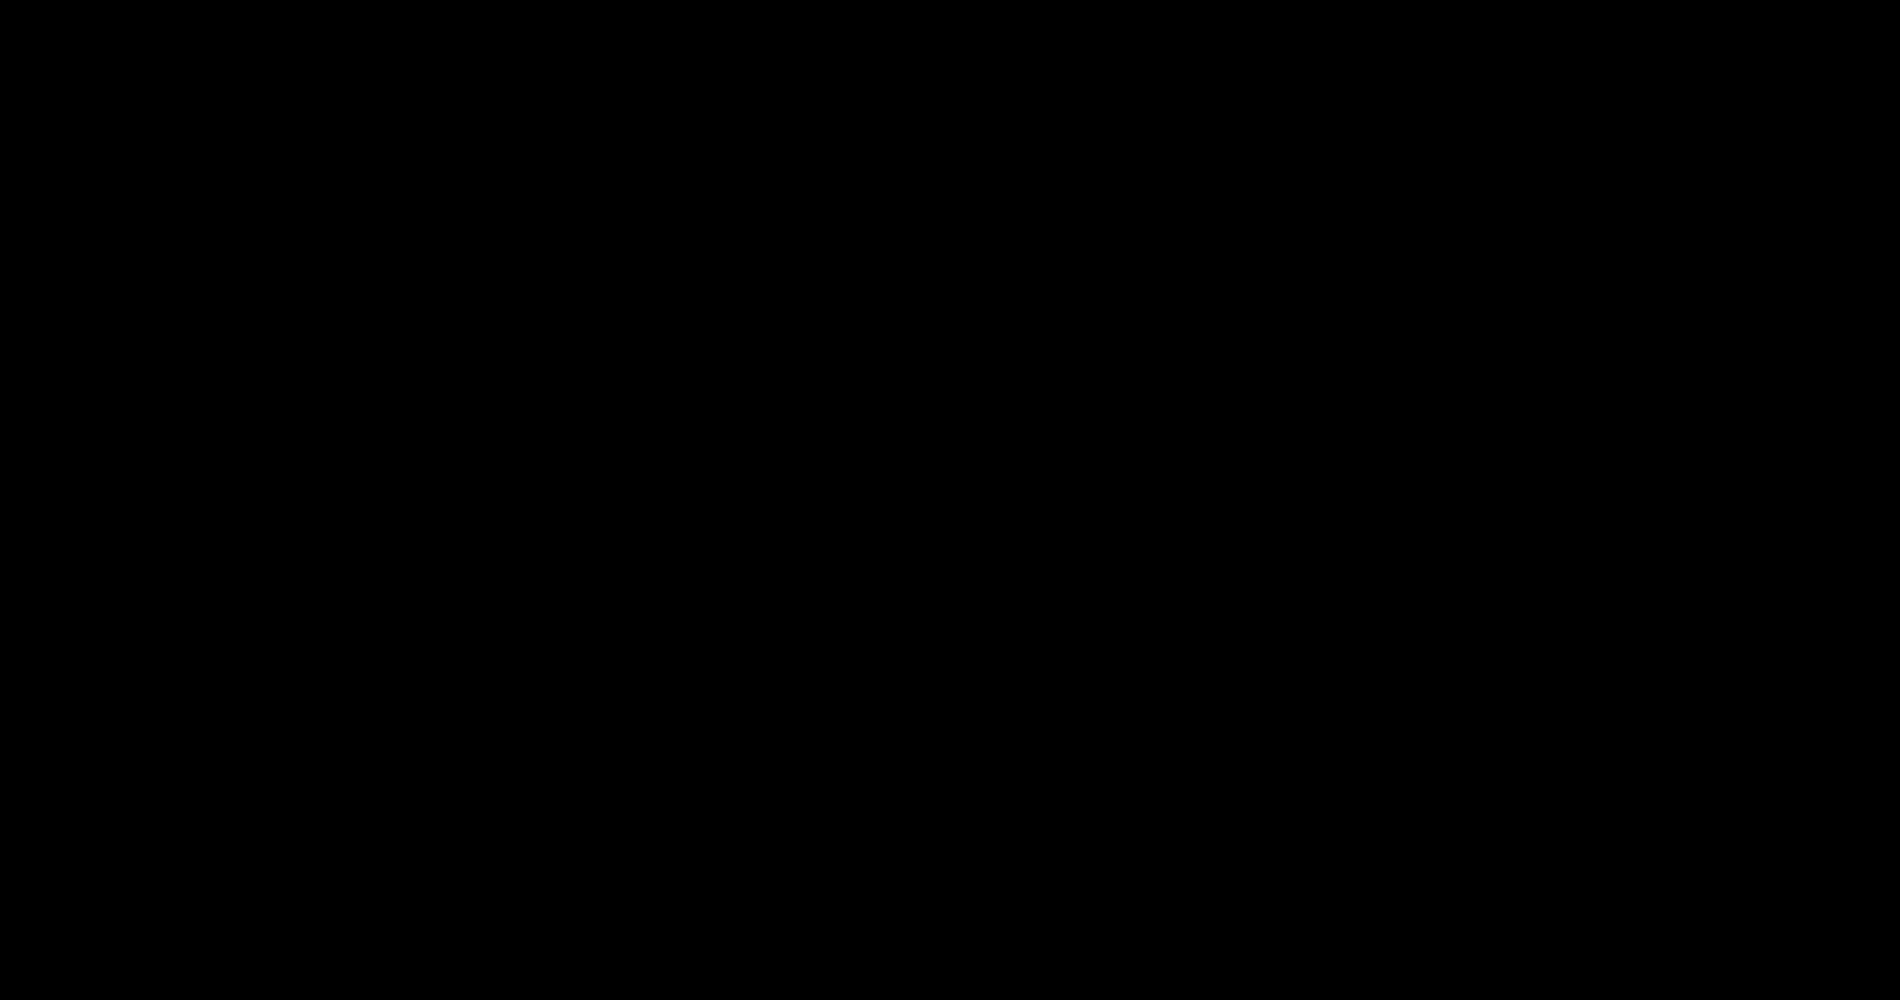 Stoponlineabuse